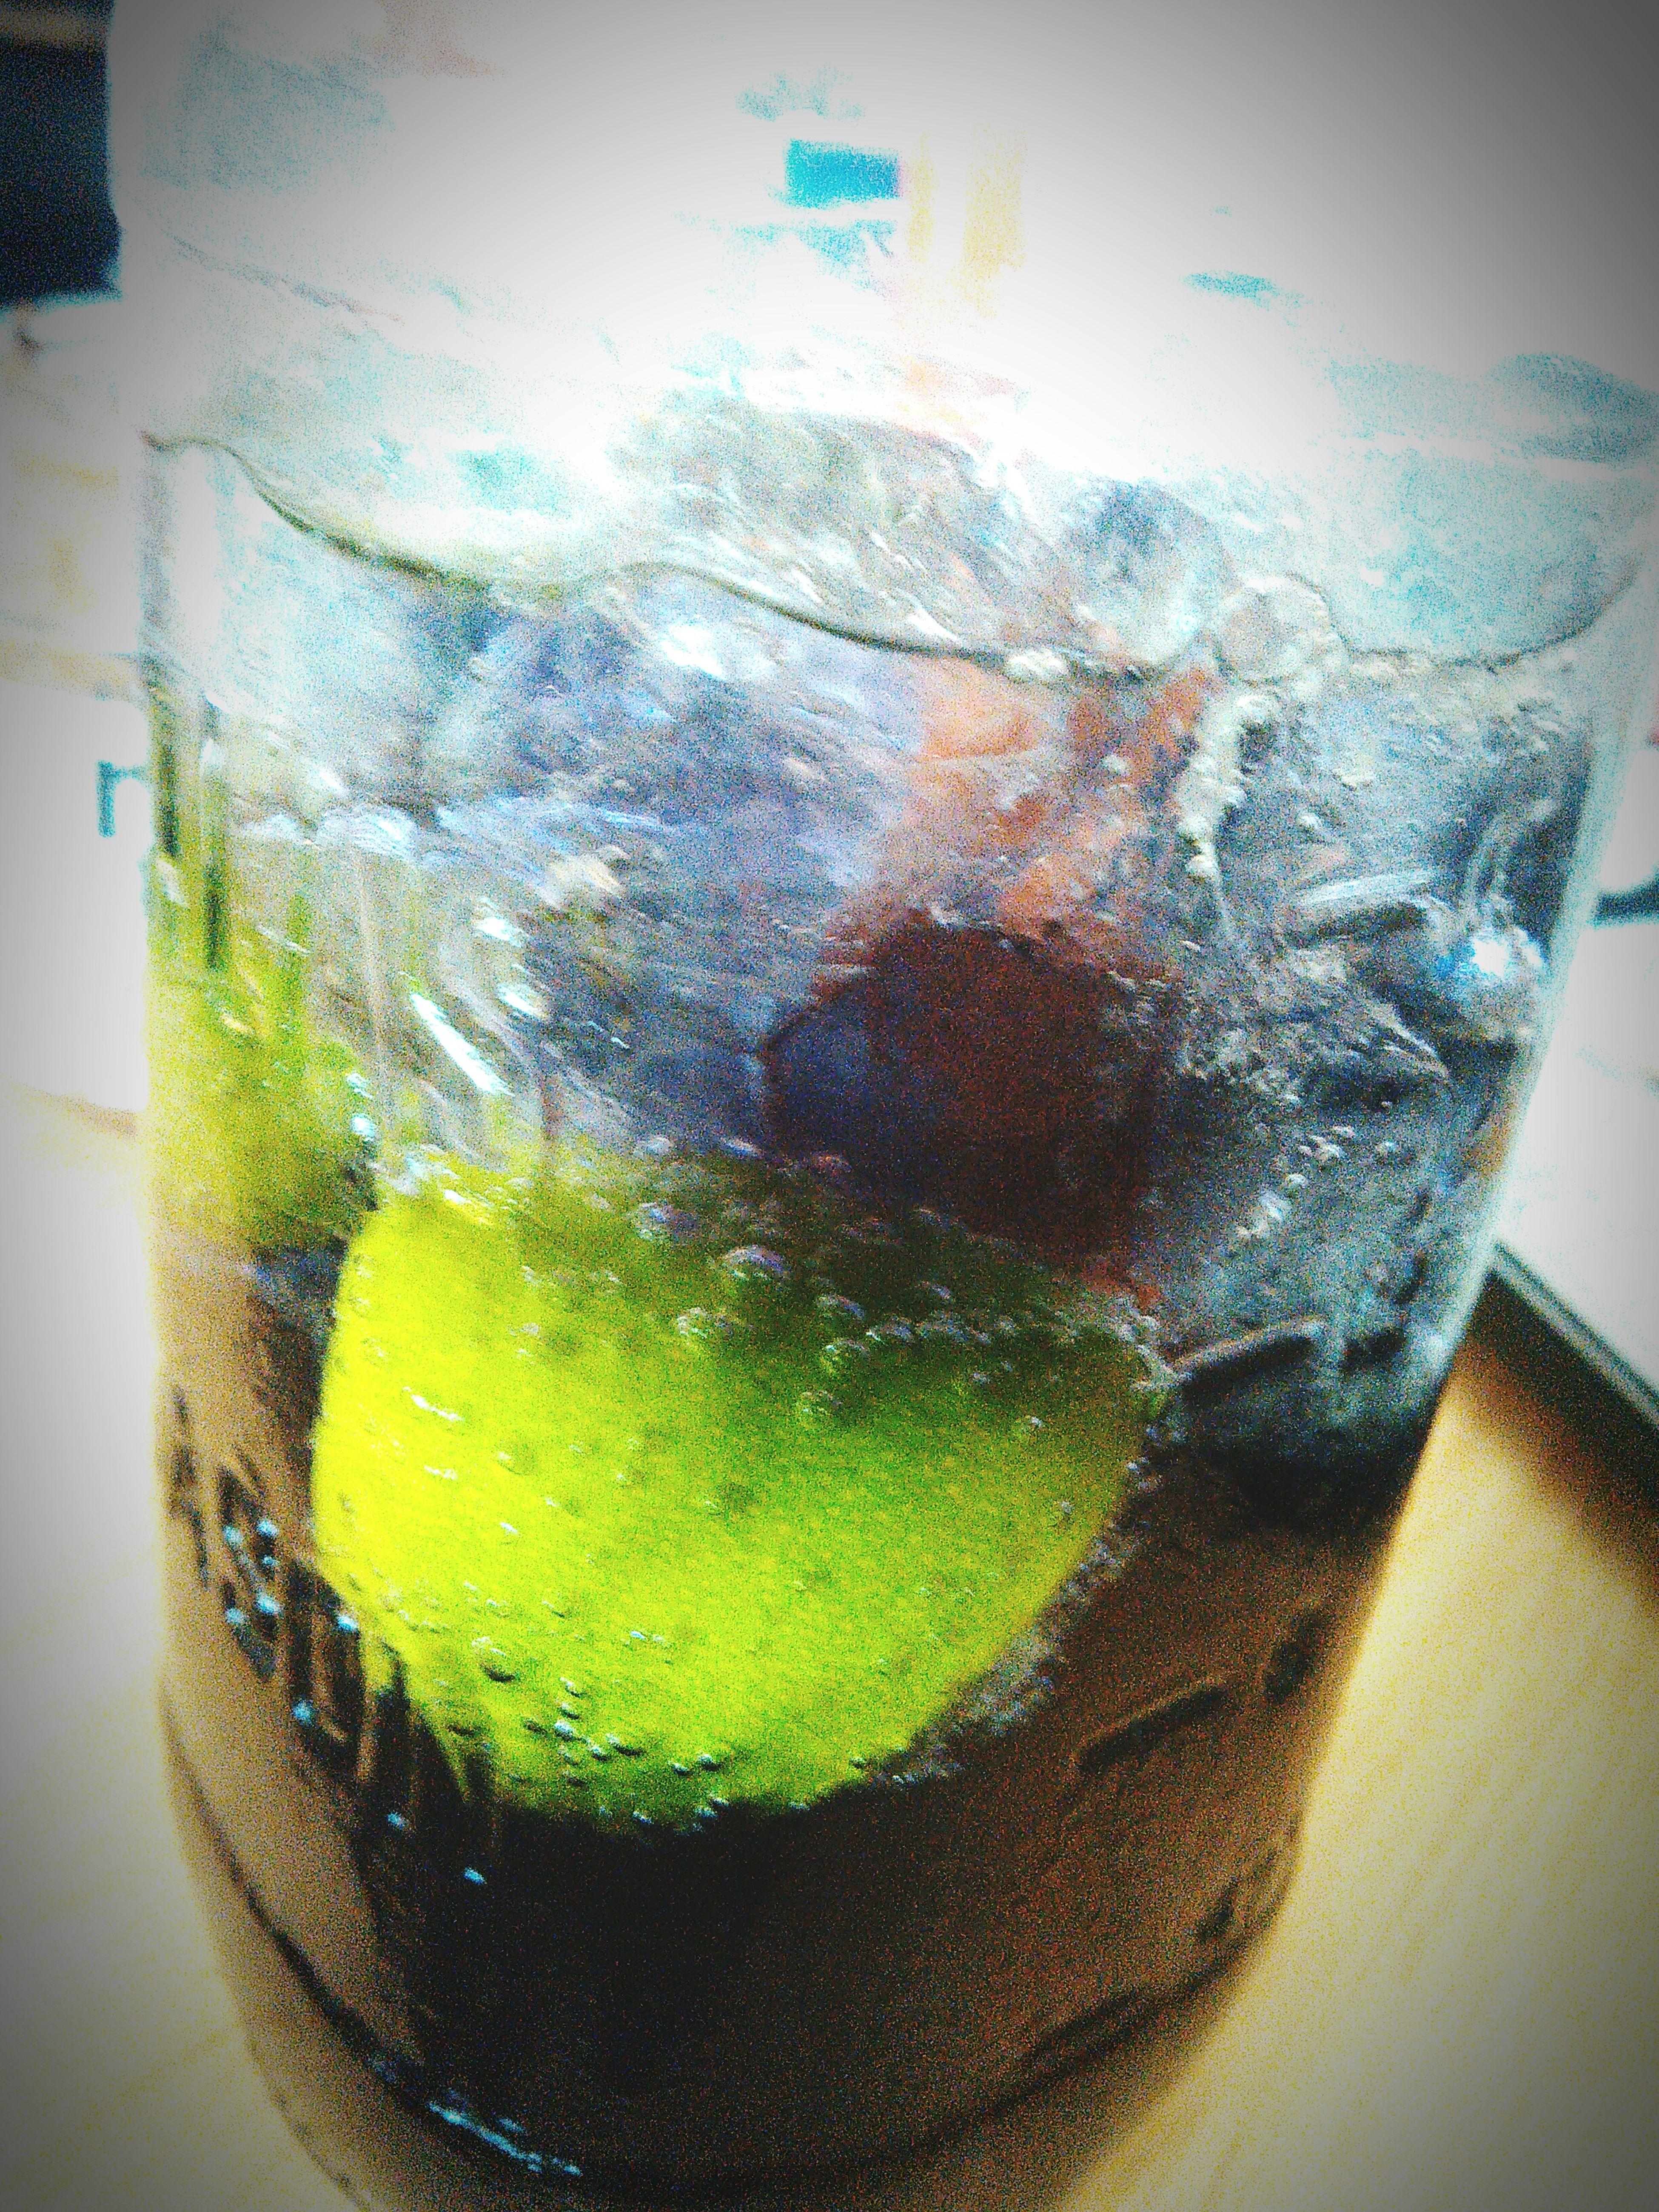 LimeRicki Summer Drinks Ice Cool Fresh Limes Yummy